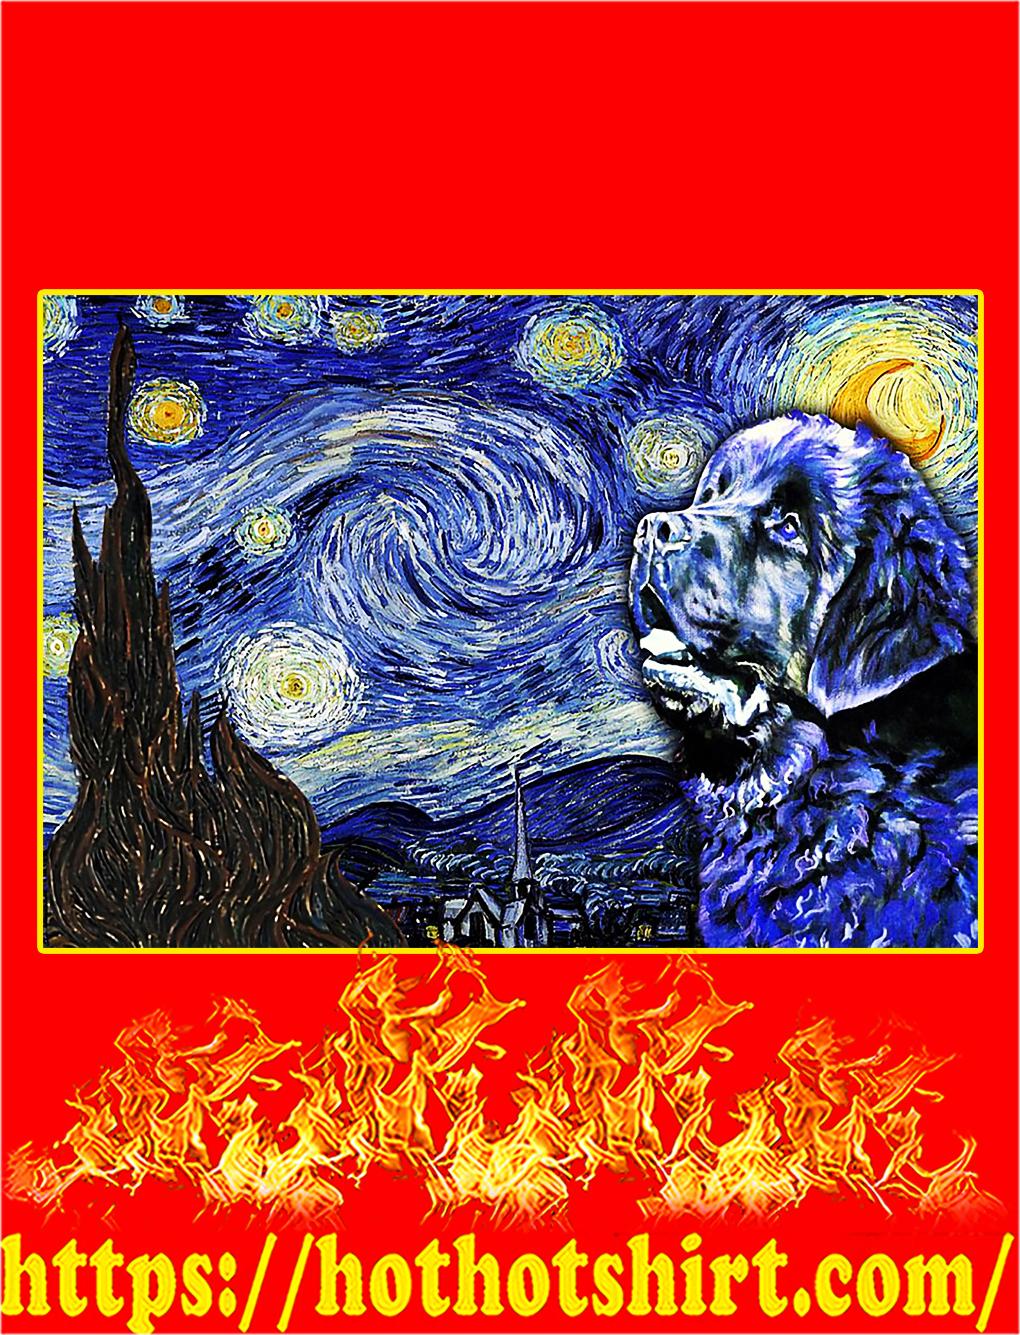 Newfoundland Dog Van Gogh Starry Night Poster - A4